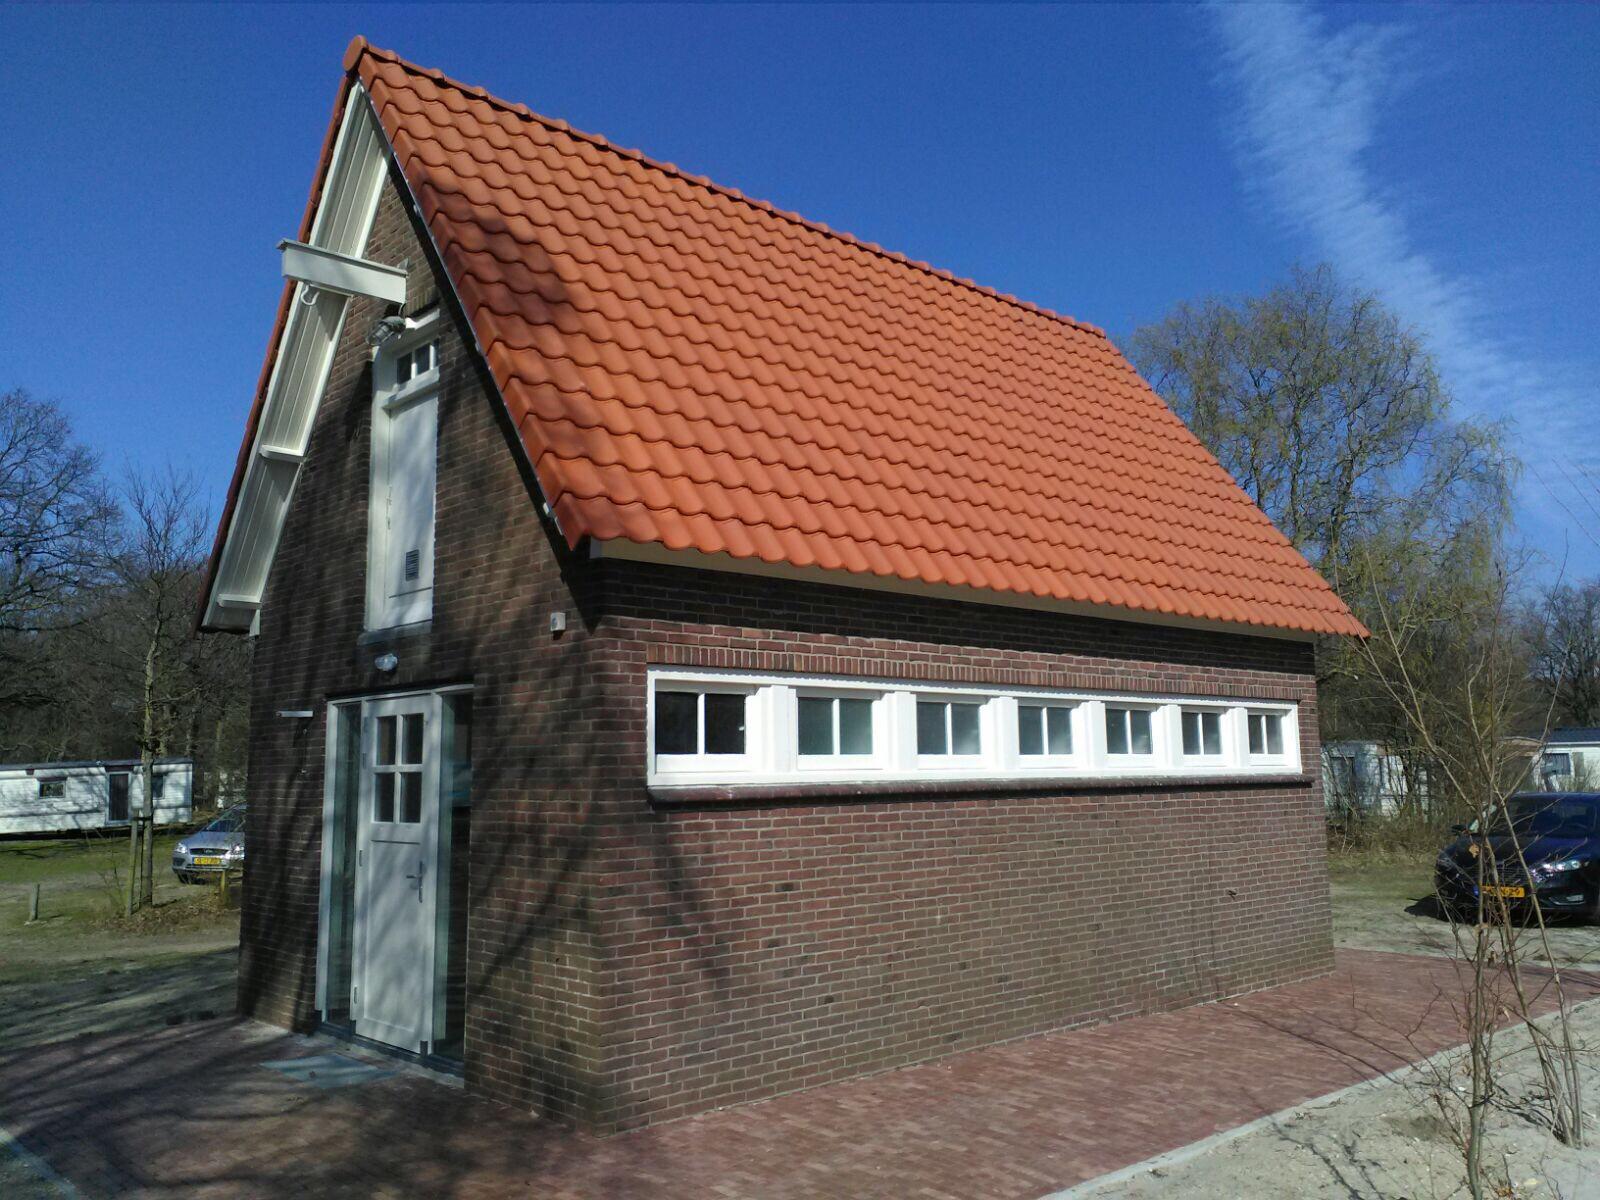 sanitairgebouw4874